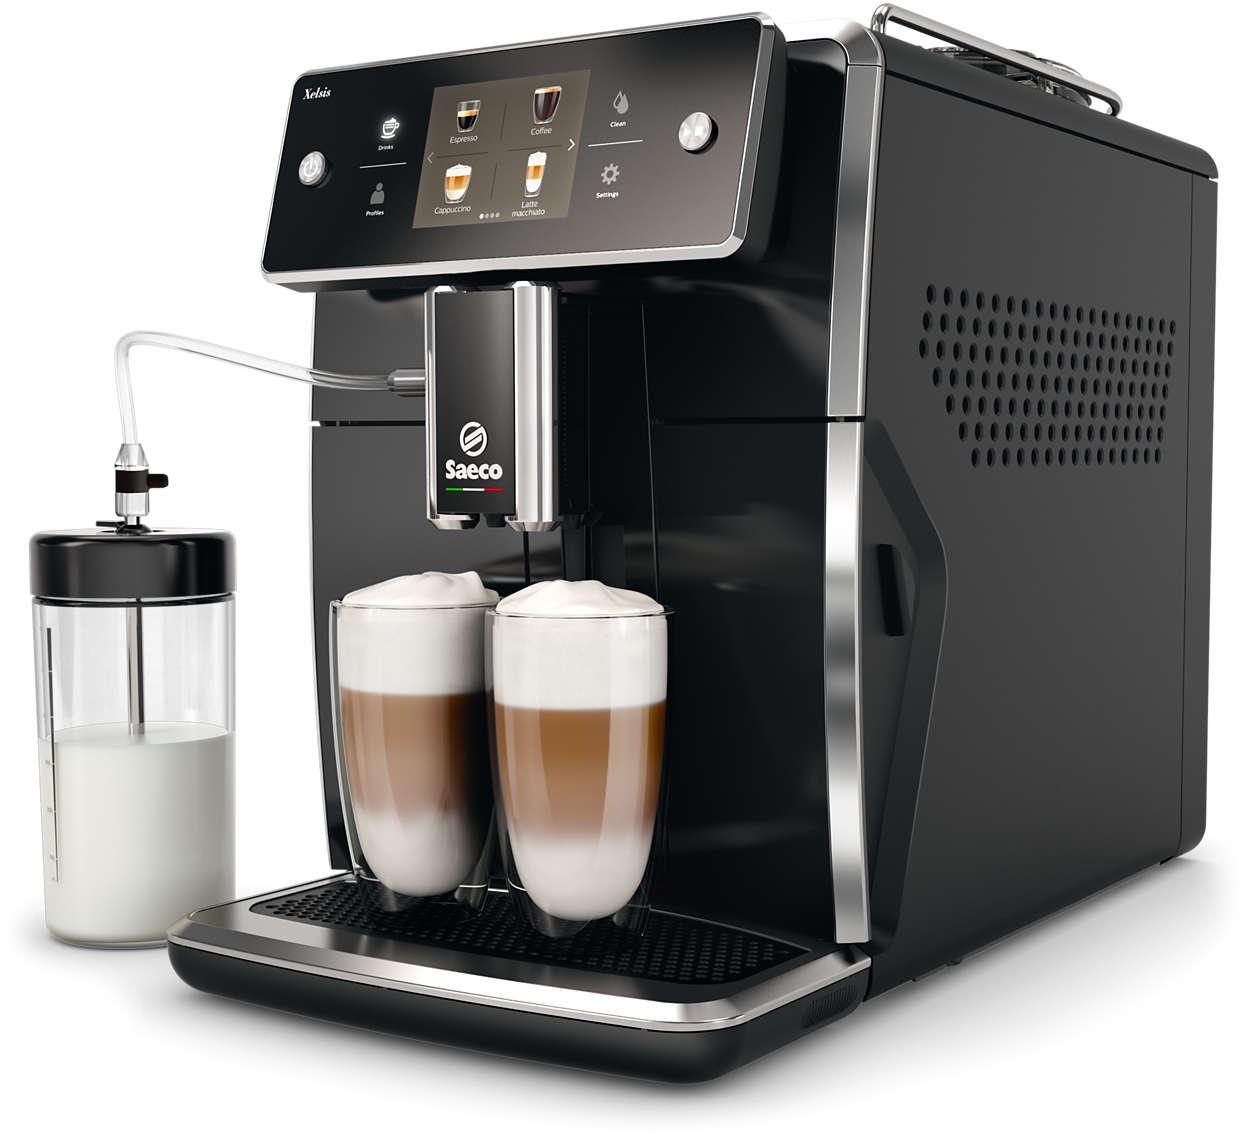 9d207843eecc Xelsis Kaffeevollautomat SM7680 00